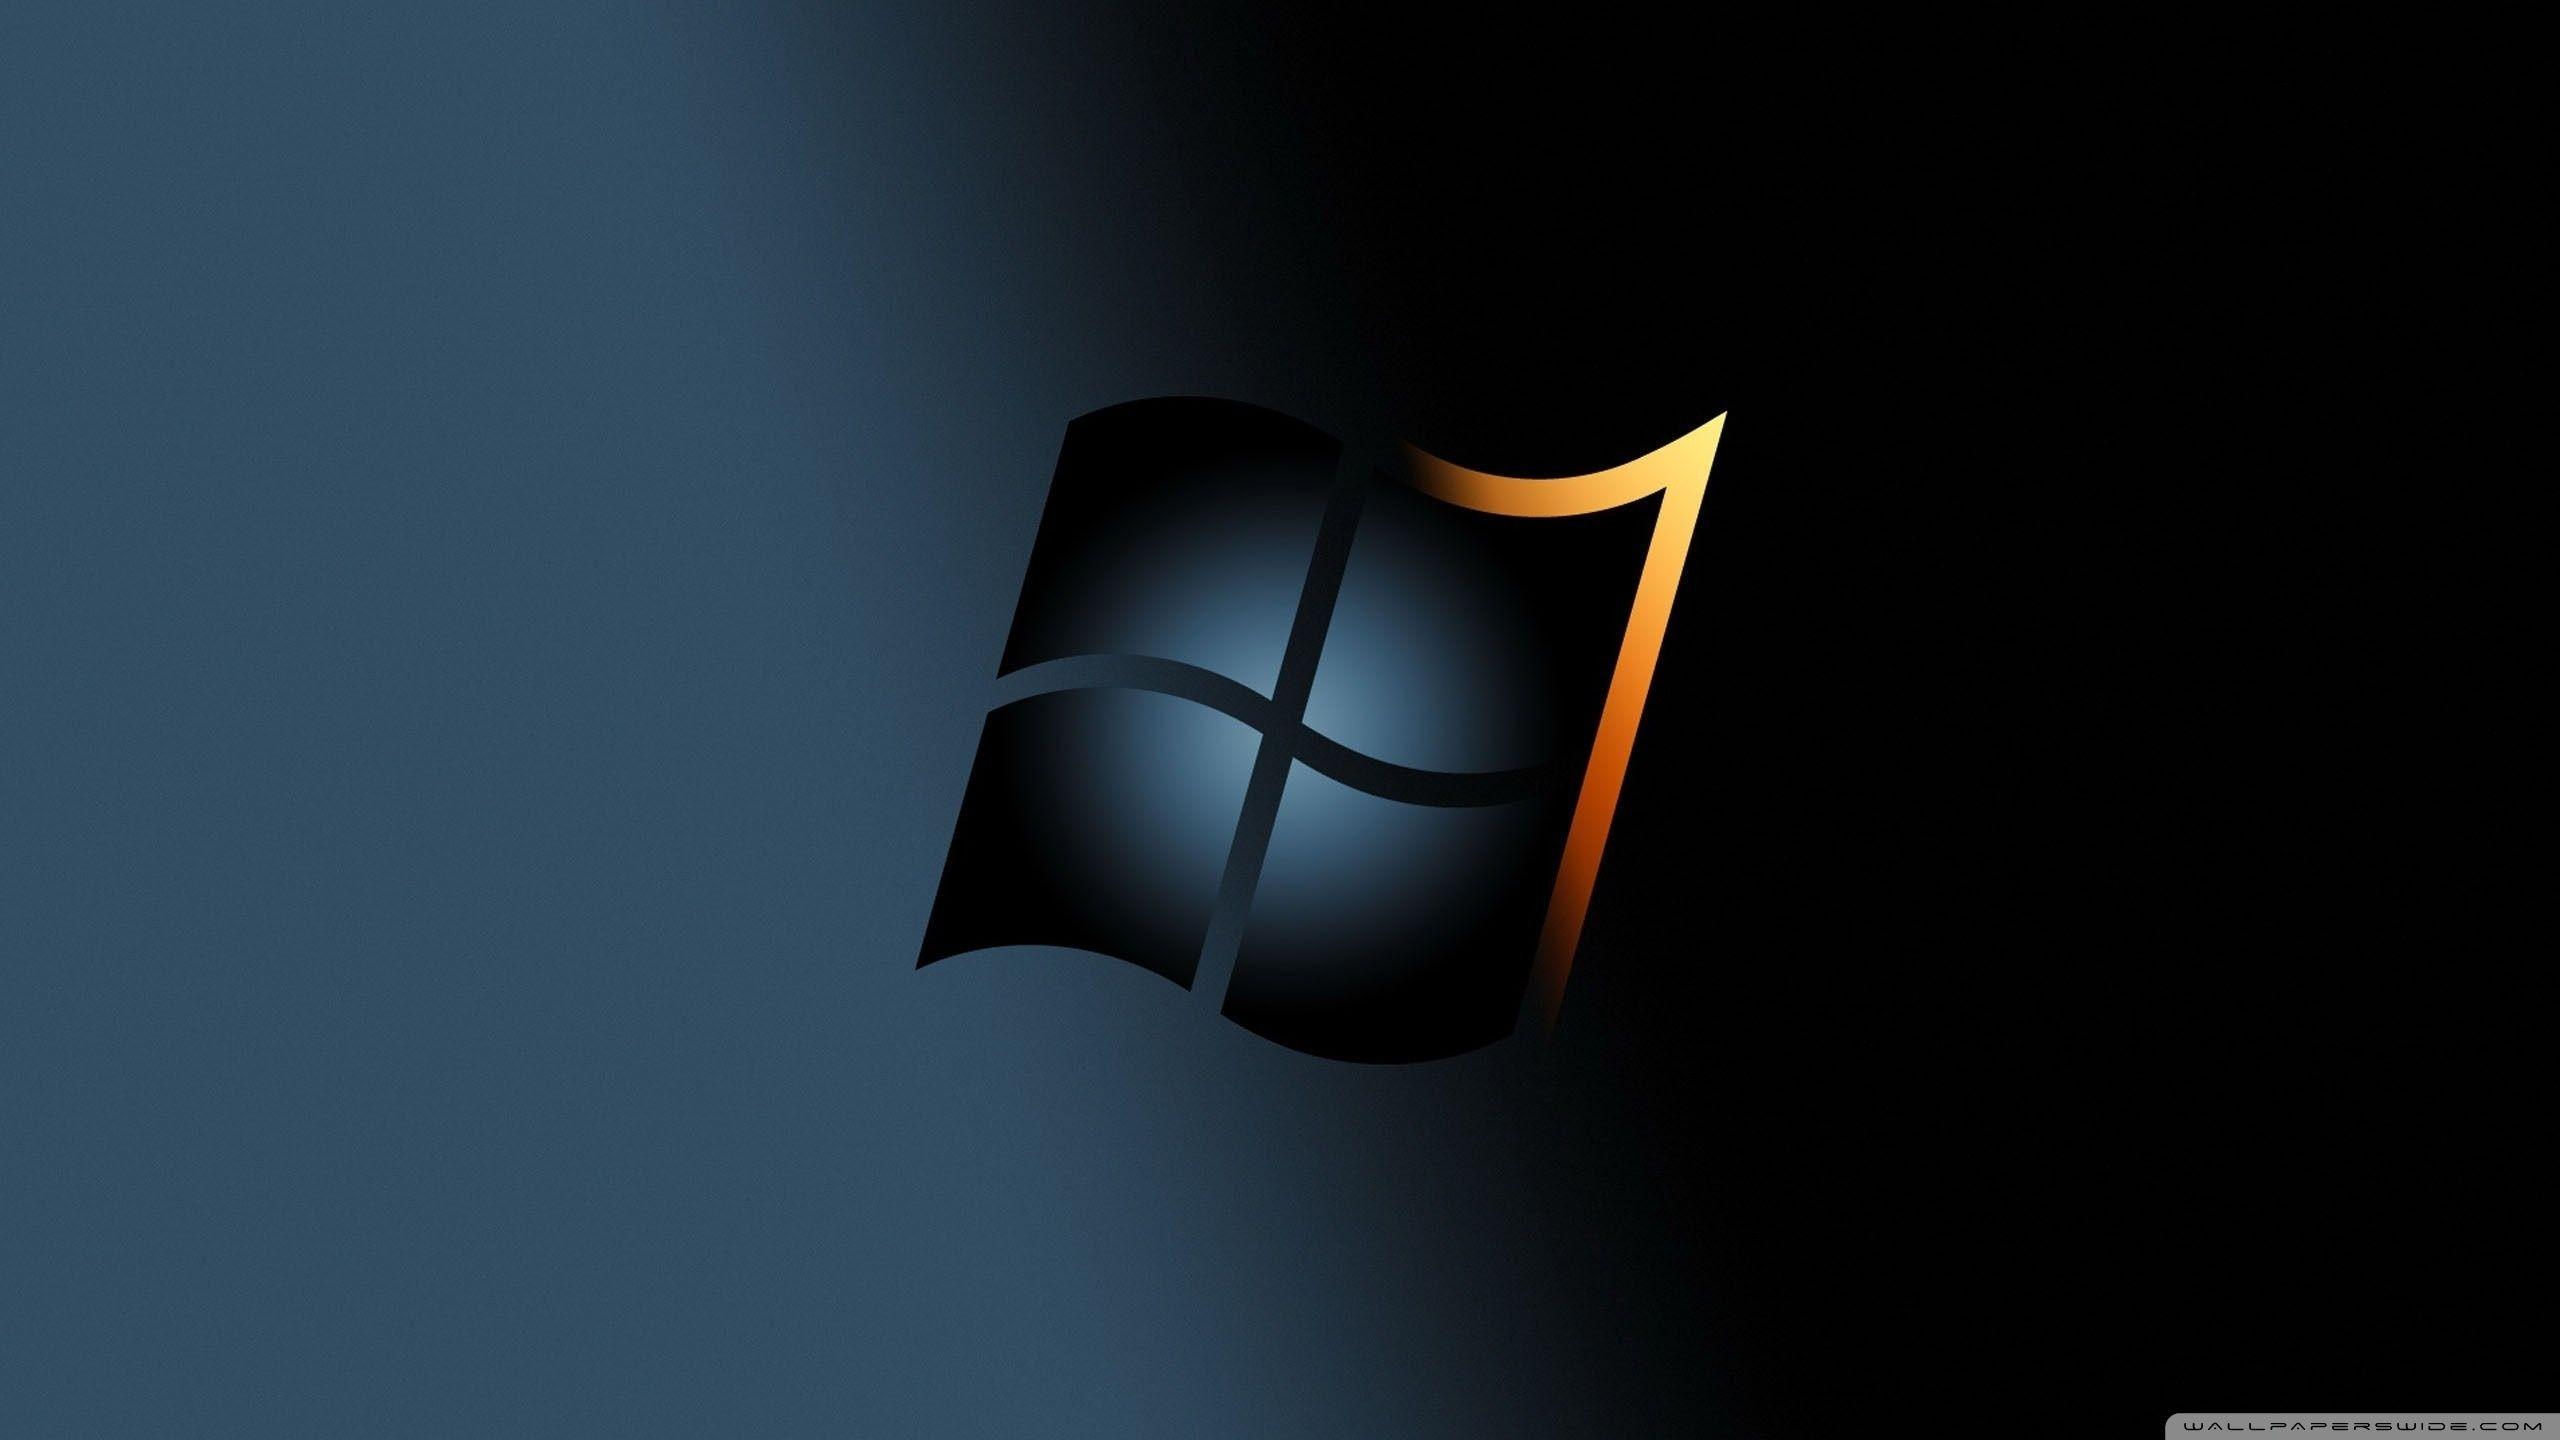 Windows 7 Pc Wallpapers Hd 1920x1080 Wallpaper Cave In 2020 Computer Wallpaper Desktop Wallpapers Desktop Wallpaper Black New Wallpaper Hd